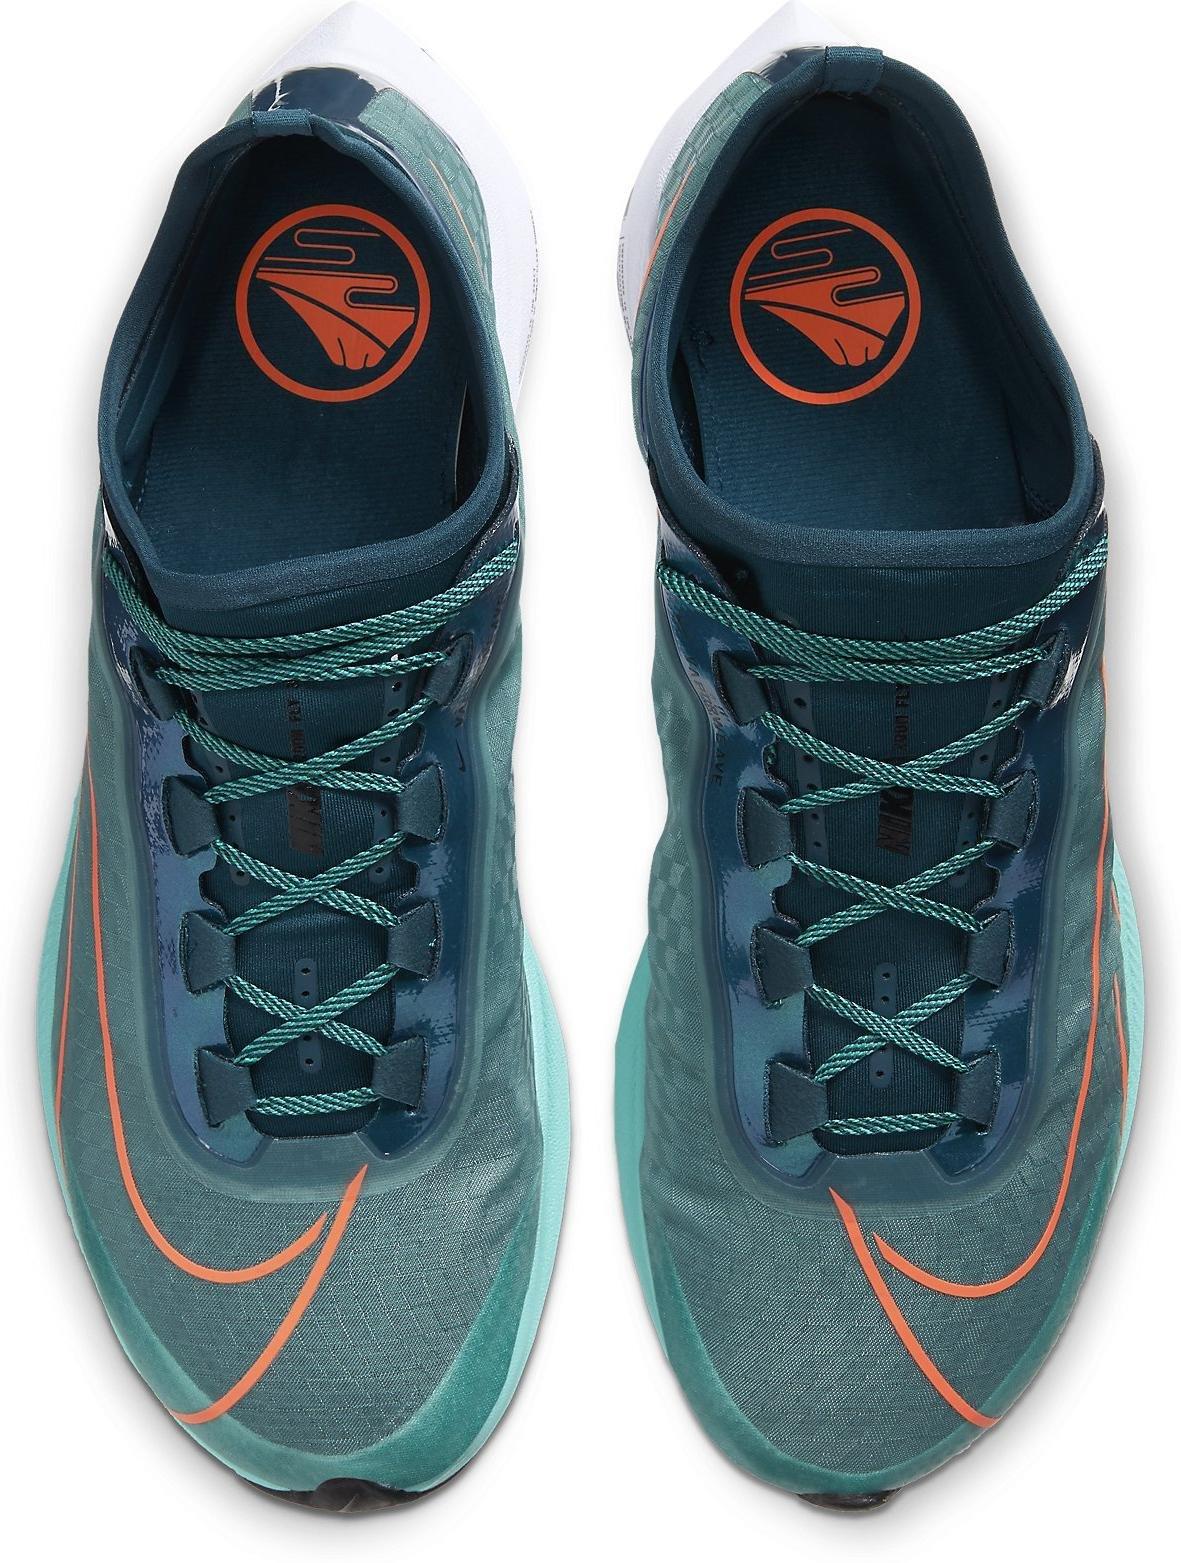 Scarpe da running Nike ZOOM FLY 3 PRM HKNE Top4Running.it  ioJC8E